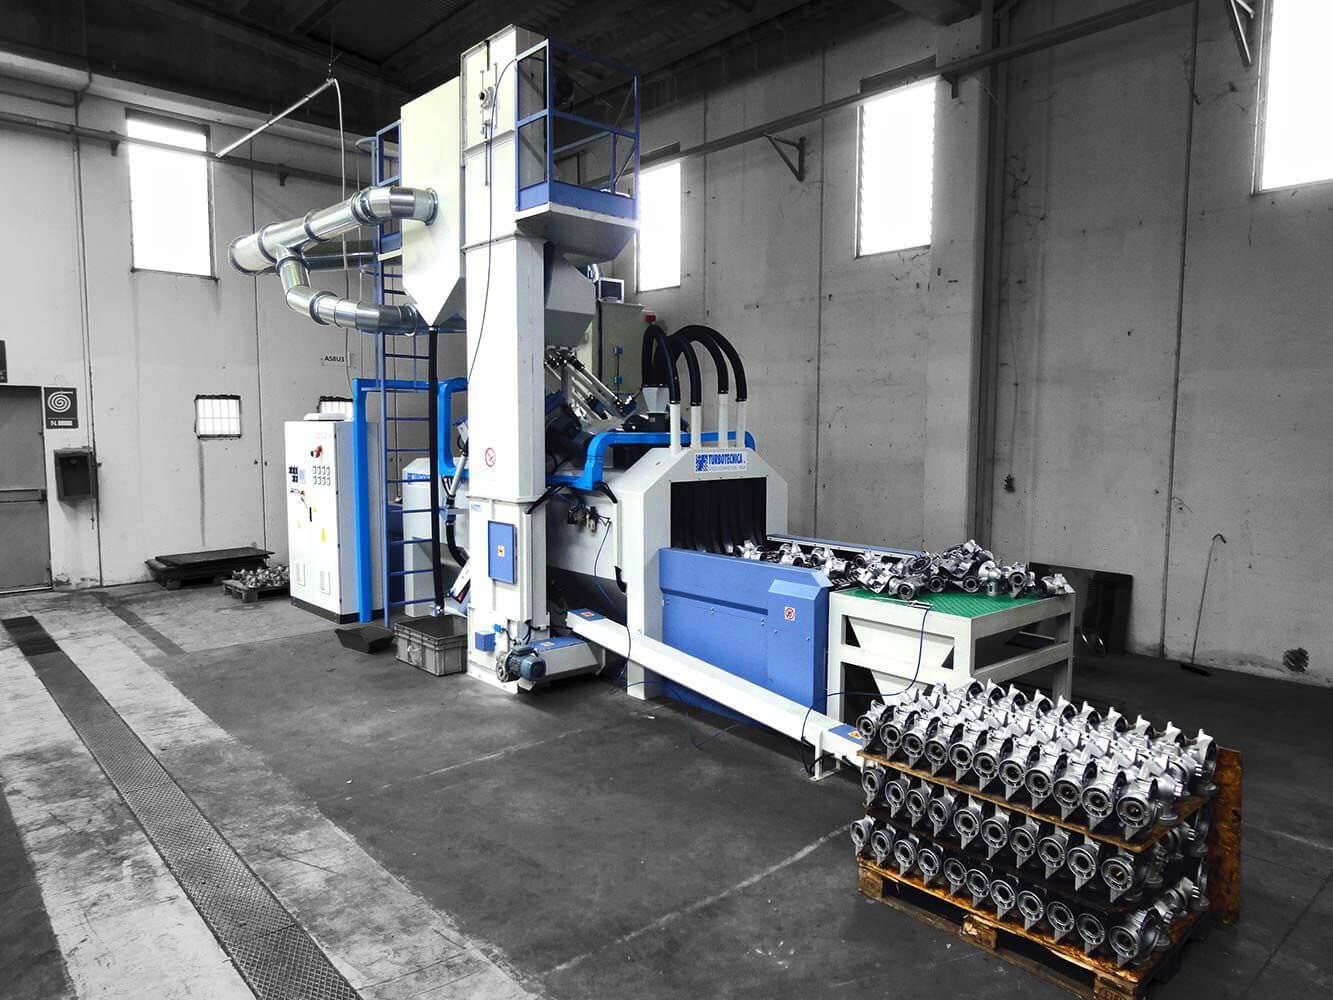 granalla-dipromet-canalizacion-refractarios-filtros-moldes-alimentación-insumos-fundición-maquinaria-mineria-Turbotecnica